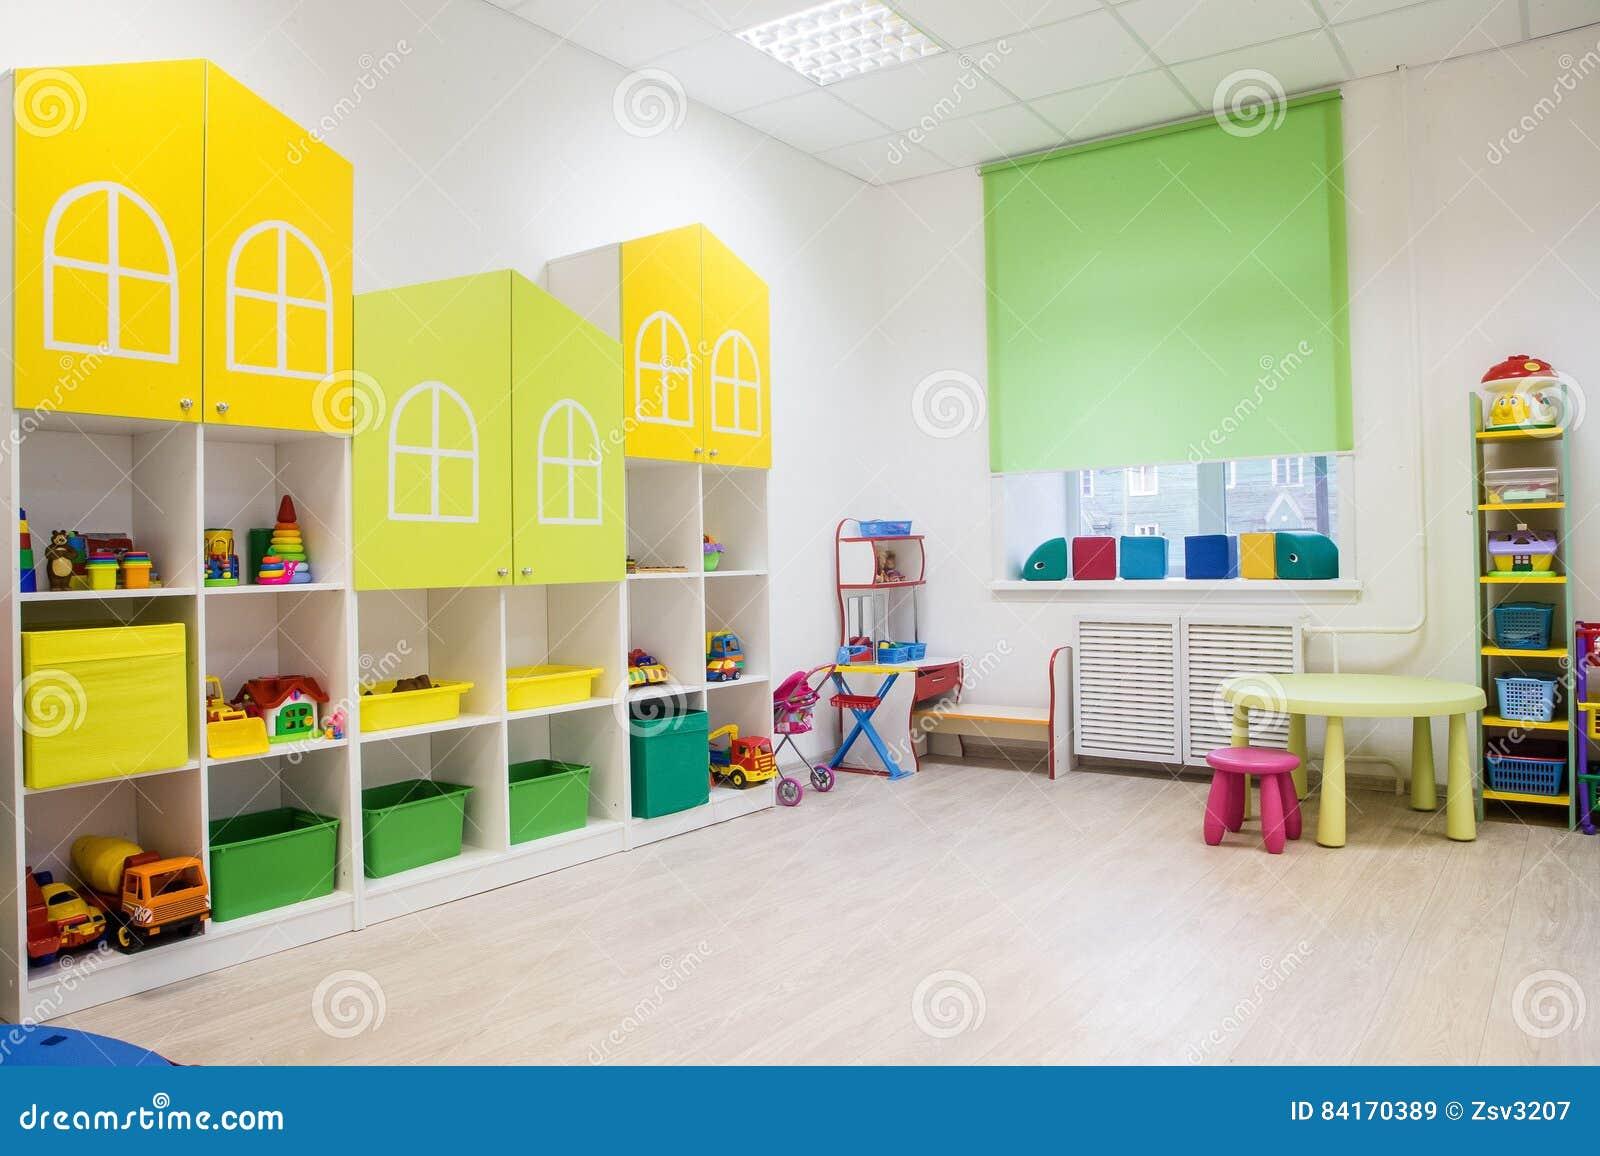 Minimalist Kindergarten Classroom : Interior of a modern kindergarten in yellow and green